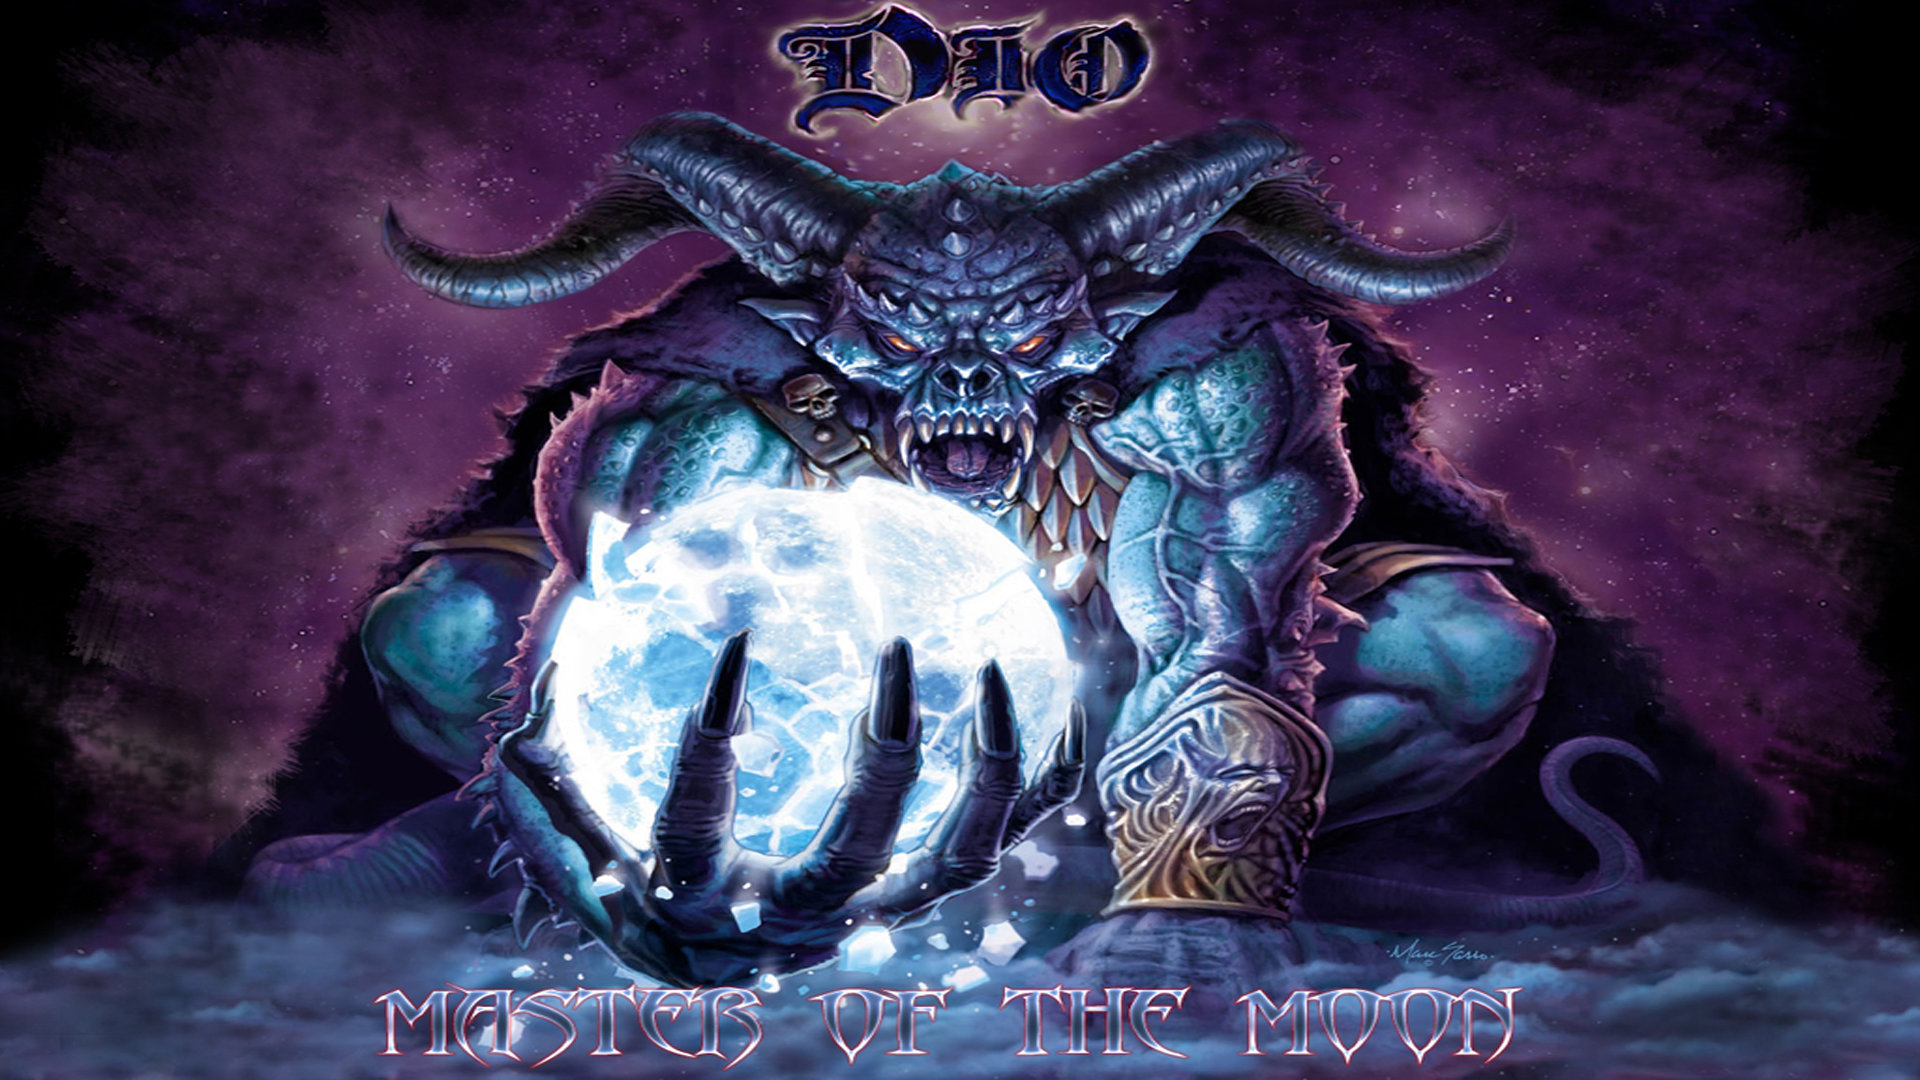 Dio wallpapers 1920x1080 Full HD 1080p desktop backgrounds 1920x1080